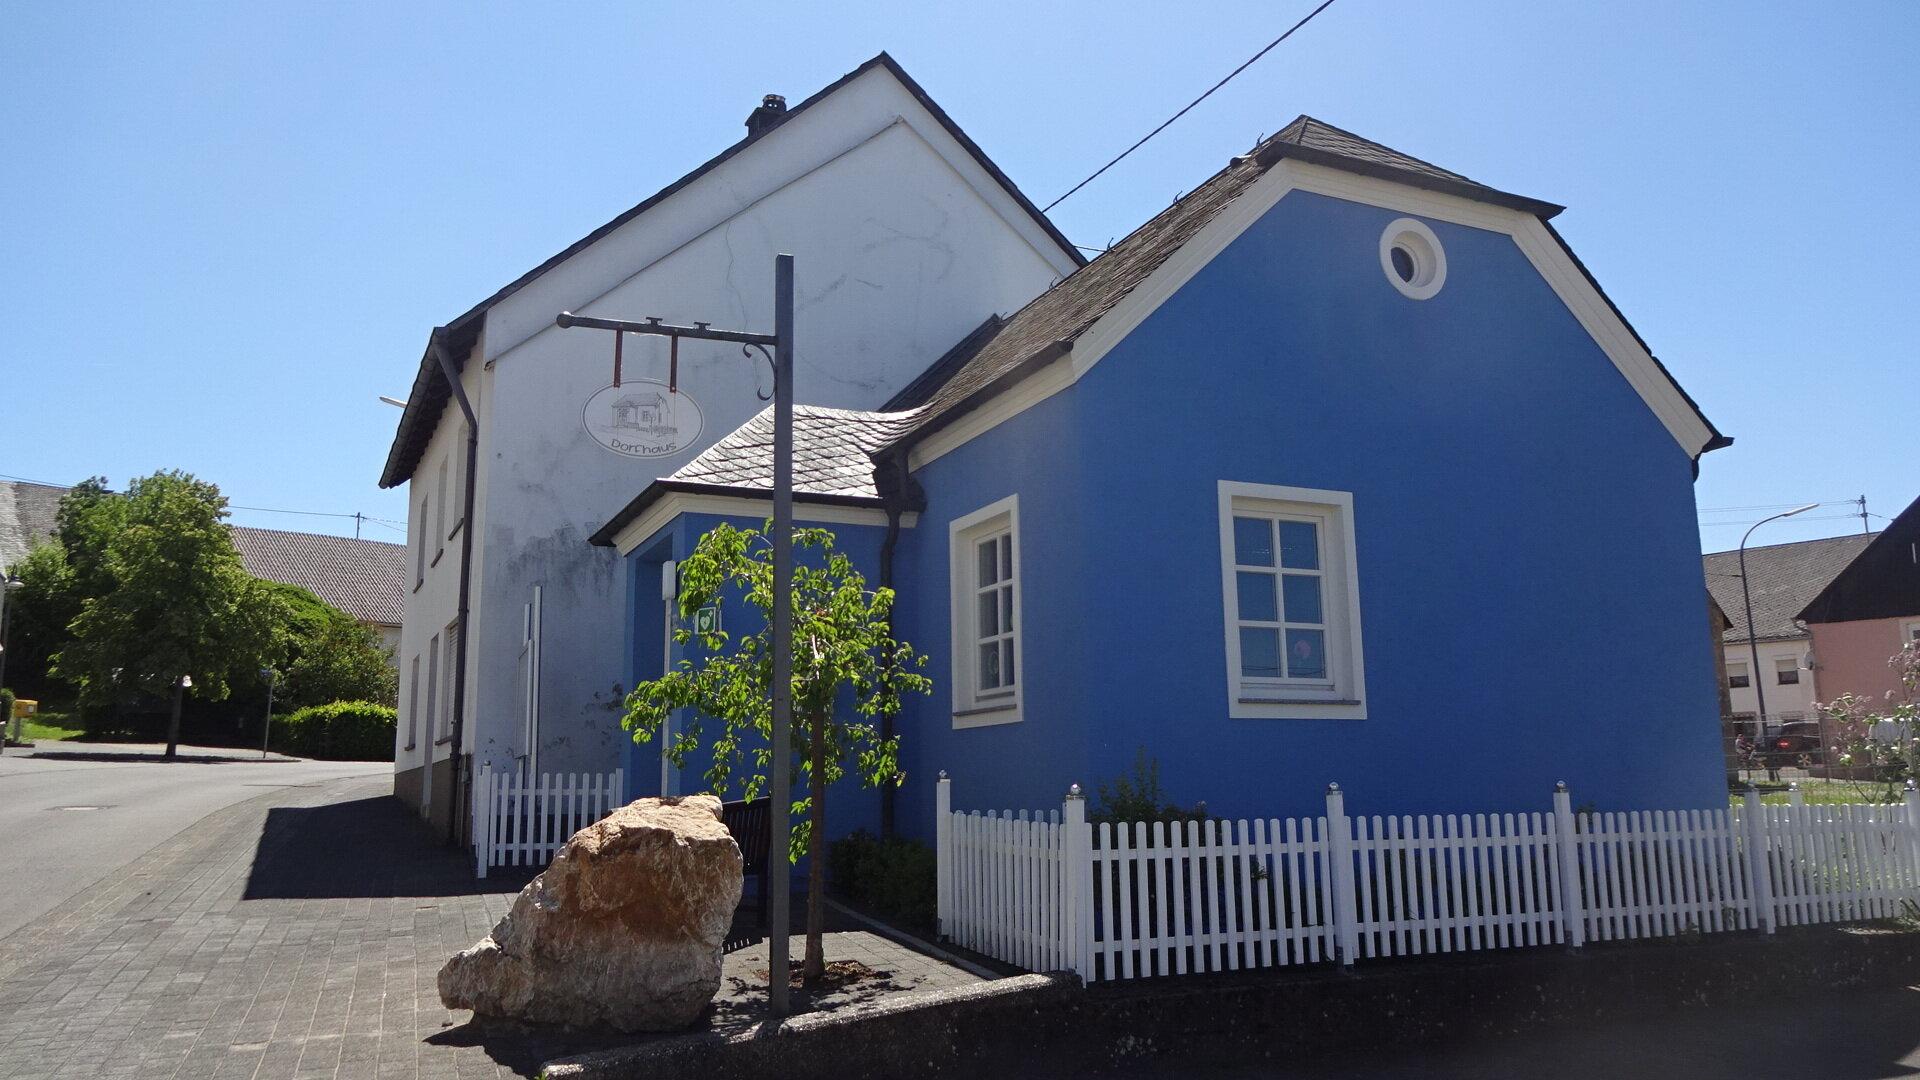 Malborn Dorfhaus